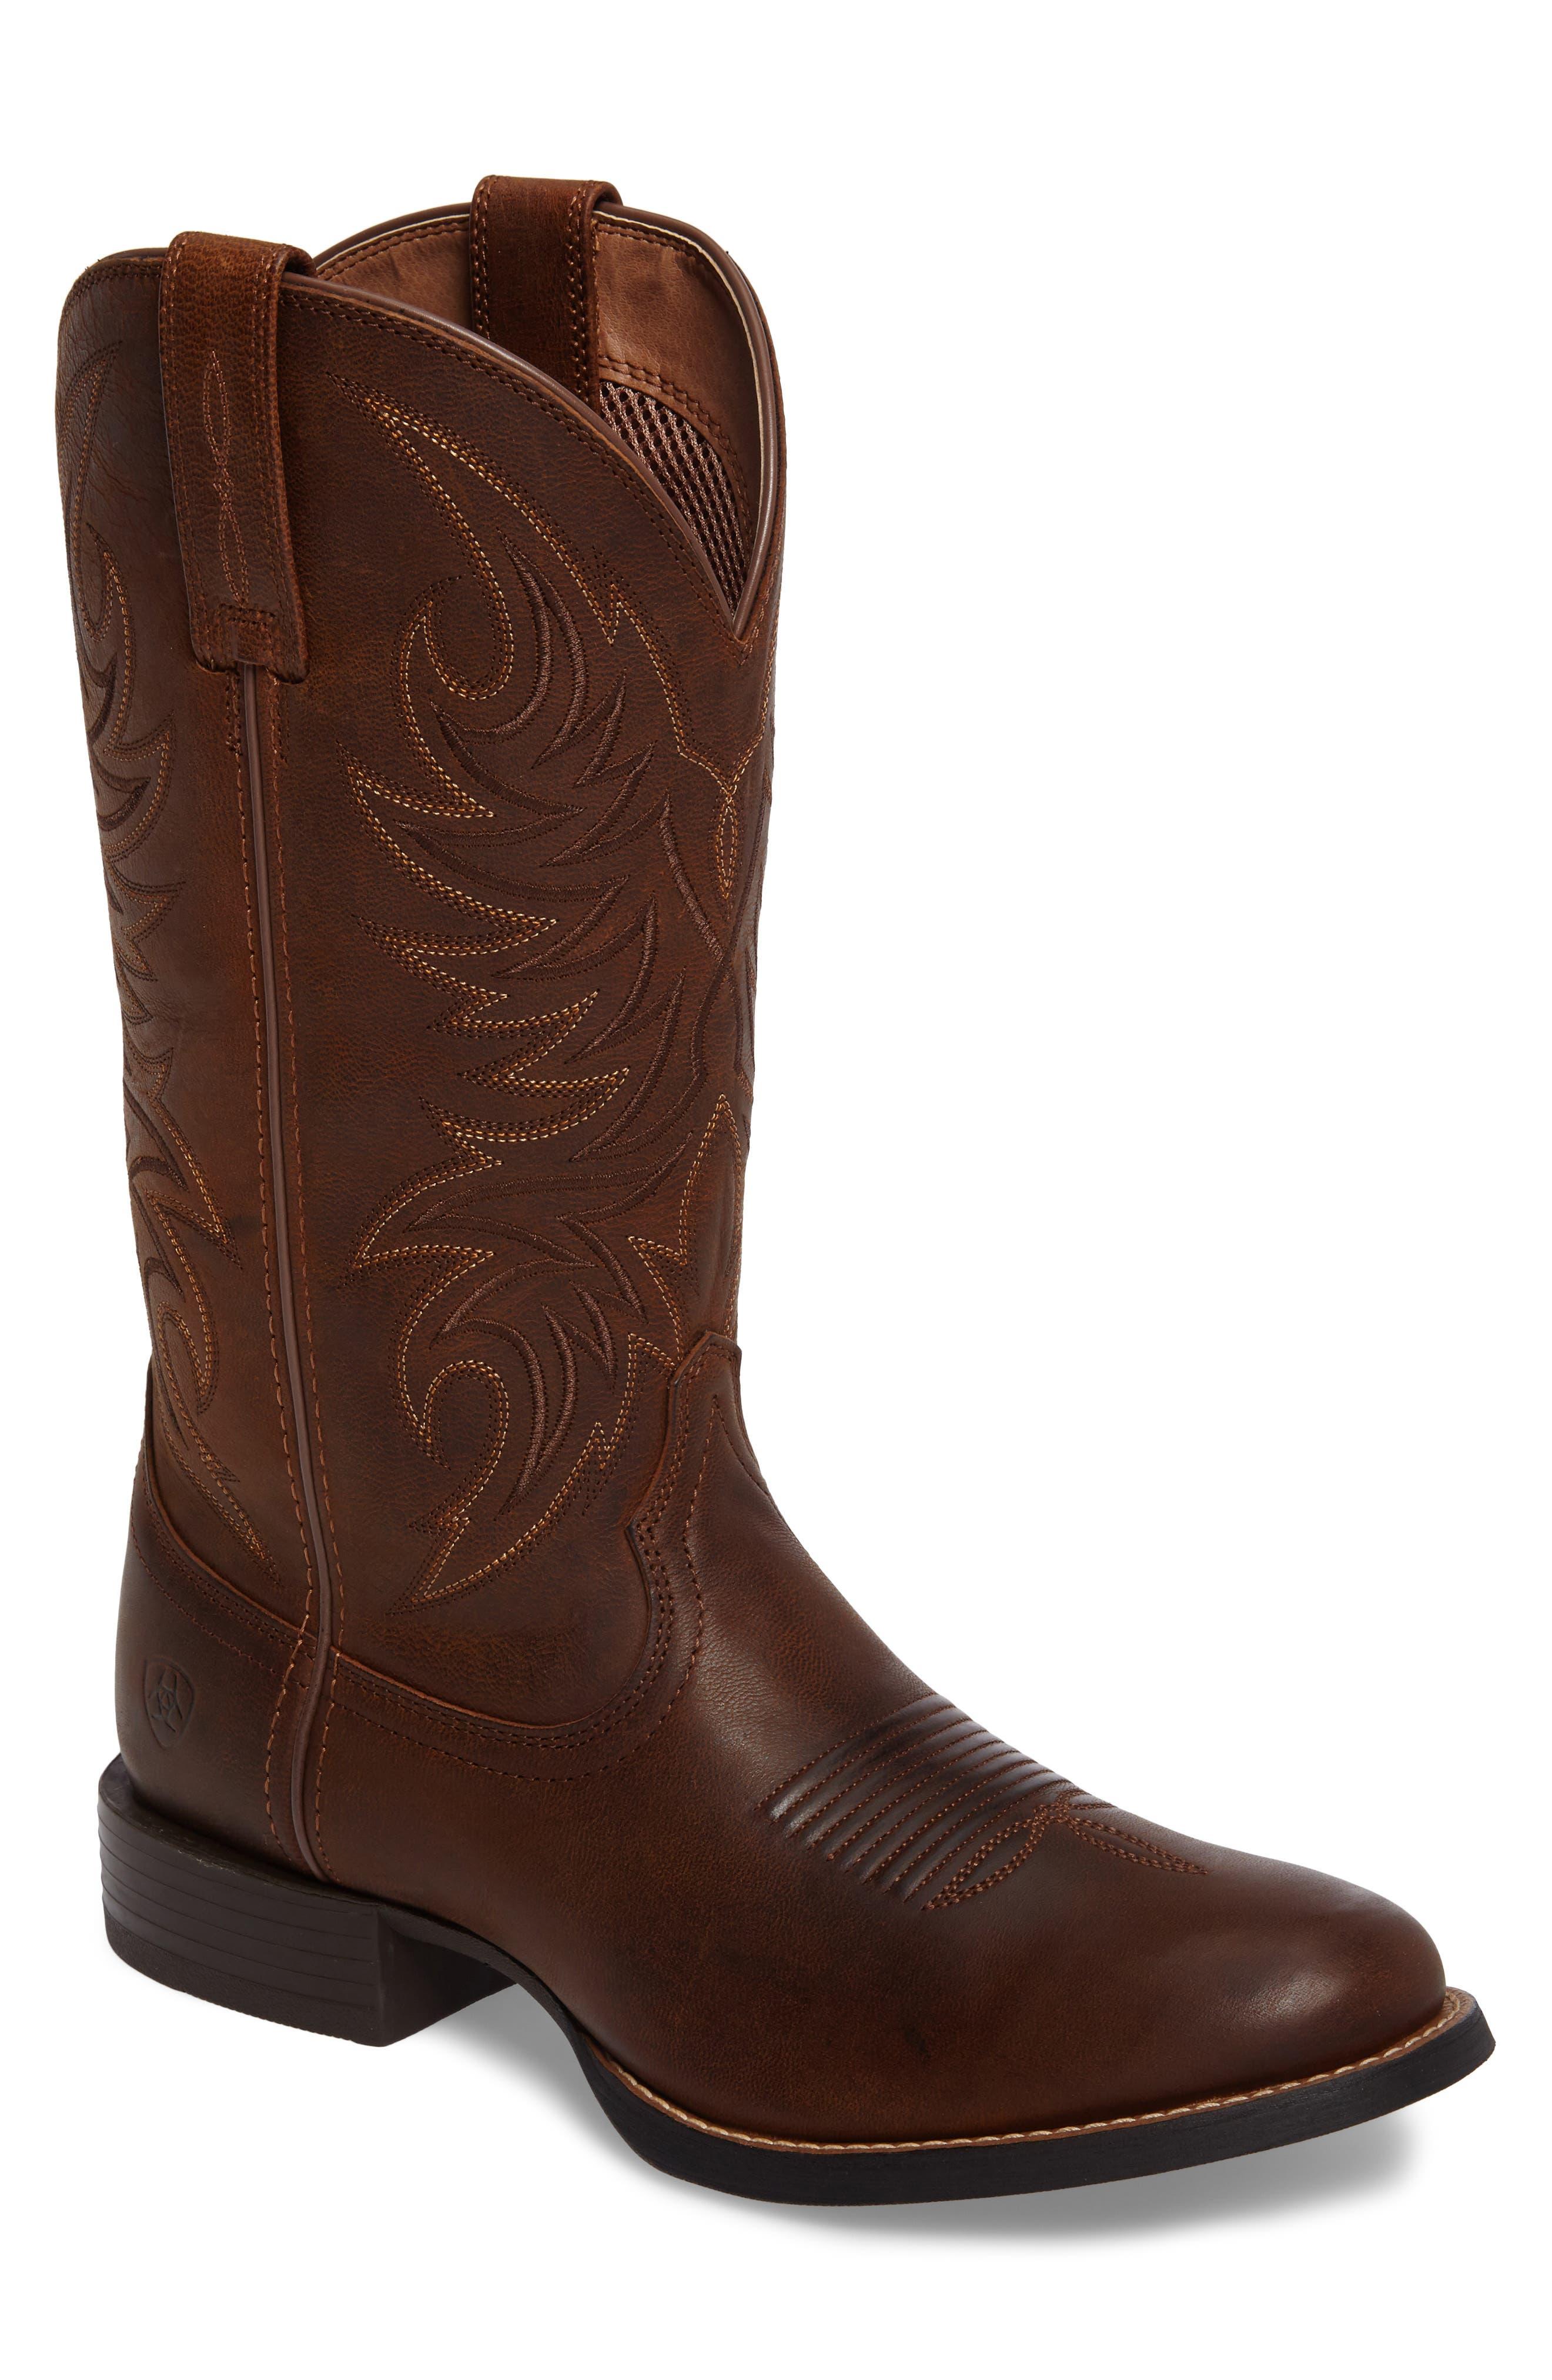 Sport Horsemen Cowboy Boot,                         Main,                         color, Tan/ Pesto